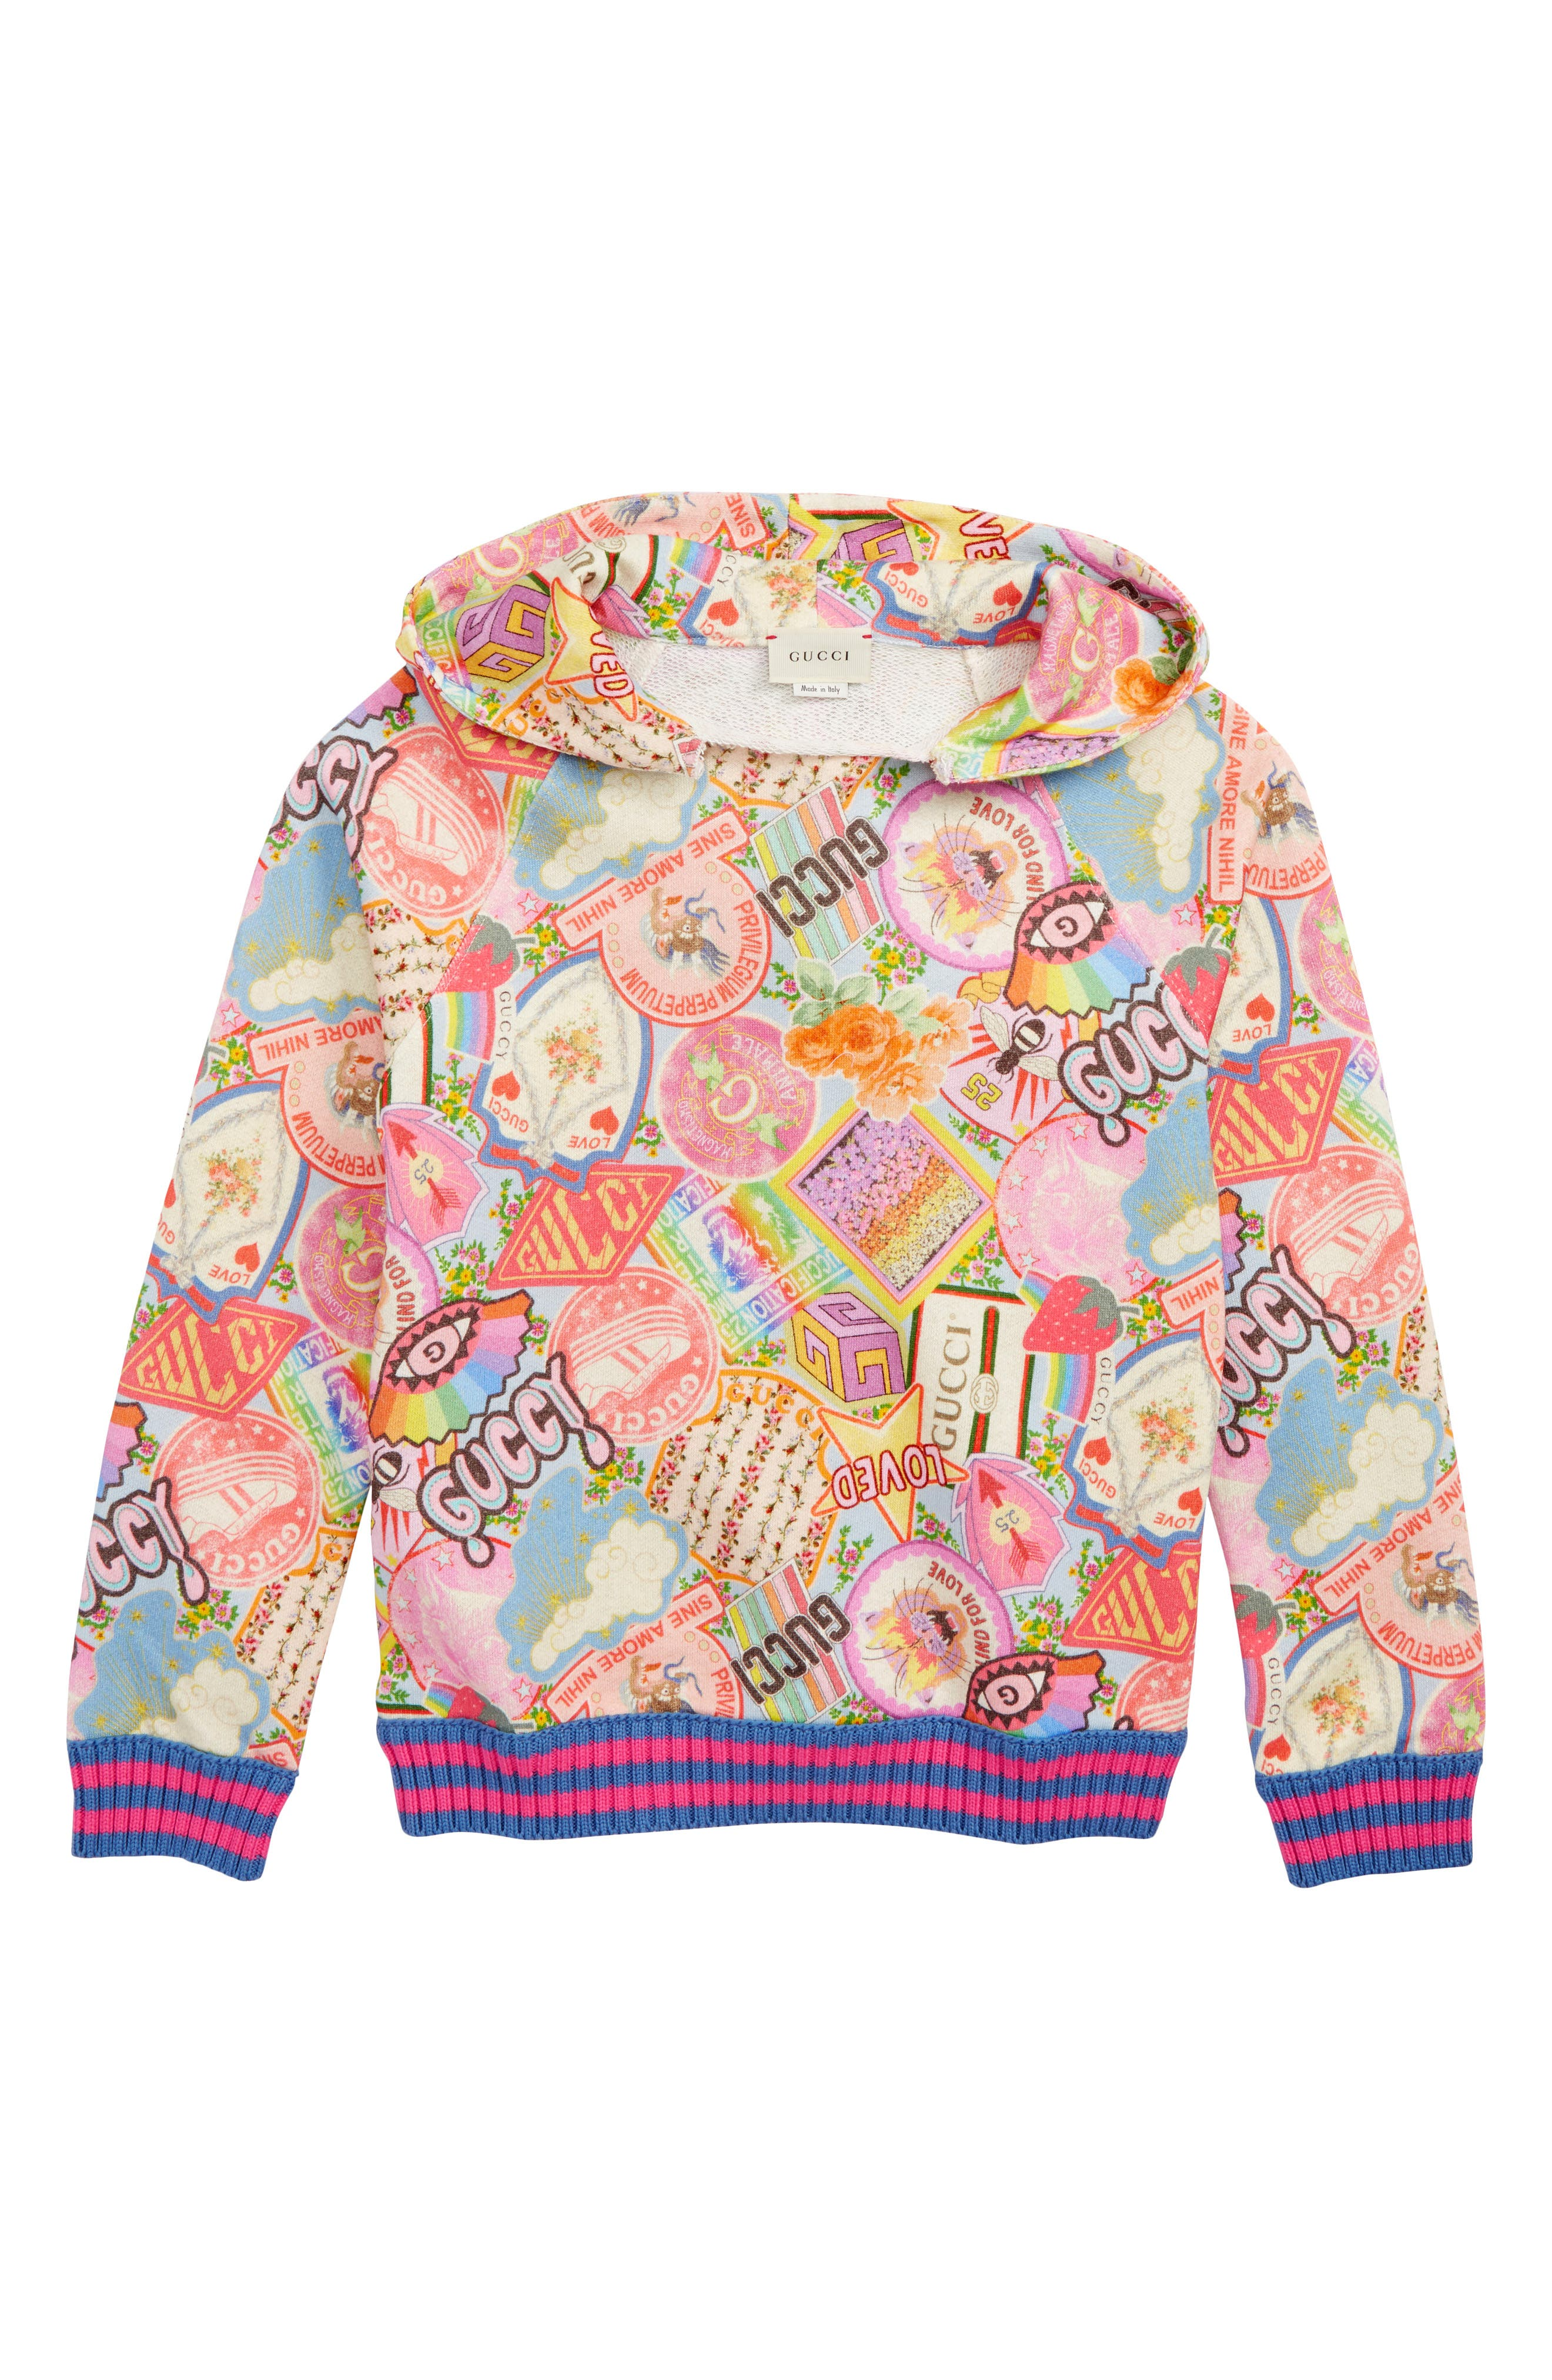 Girls Gucci Hoodie Size 6Y  Pink